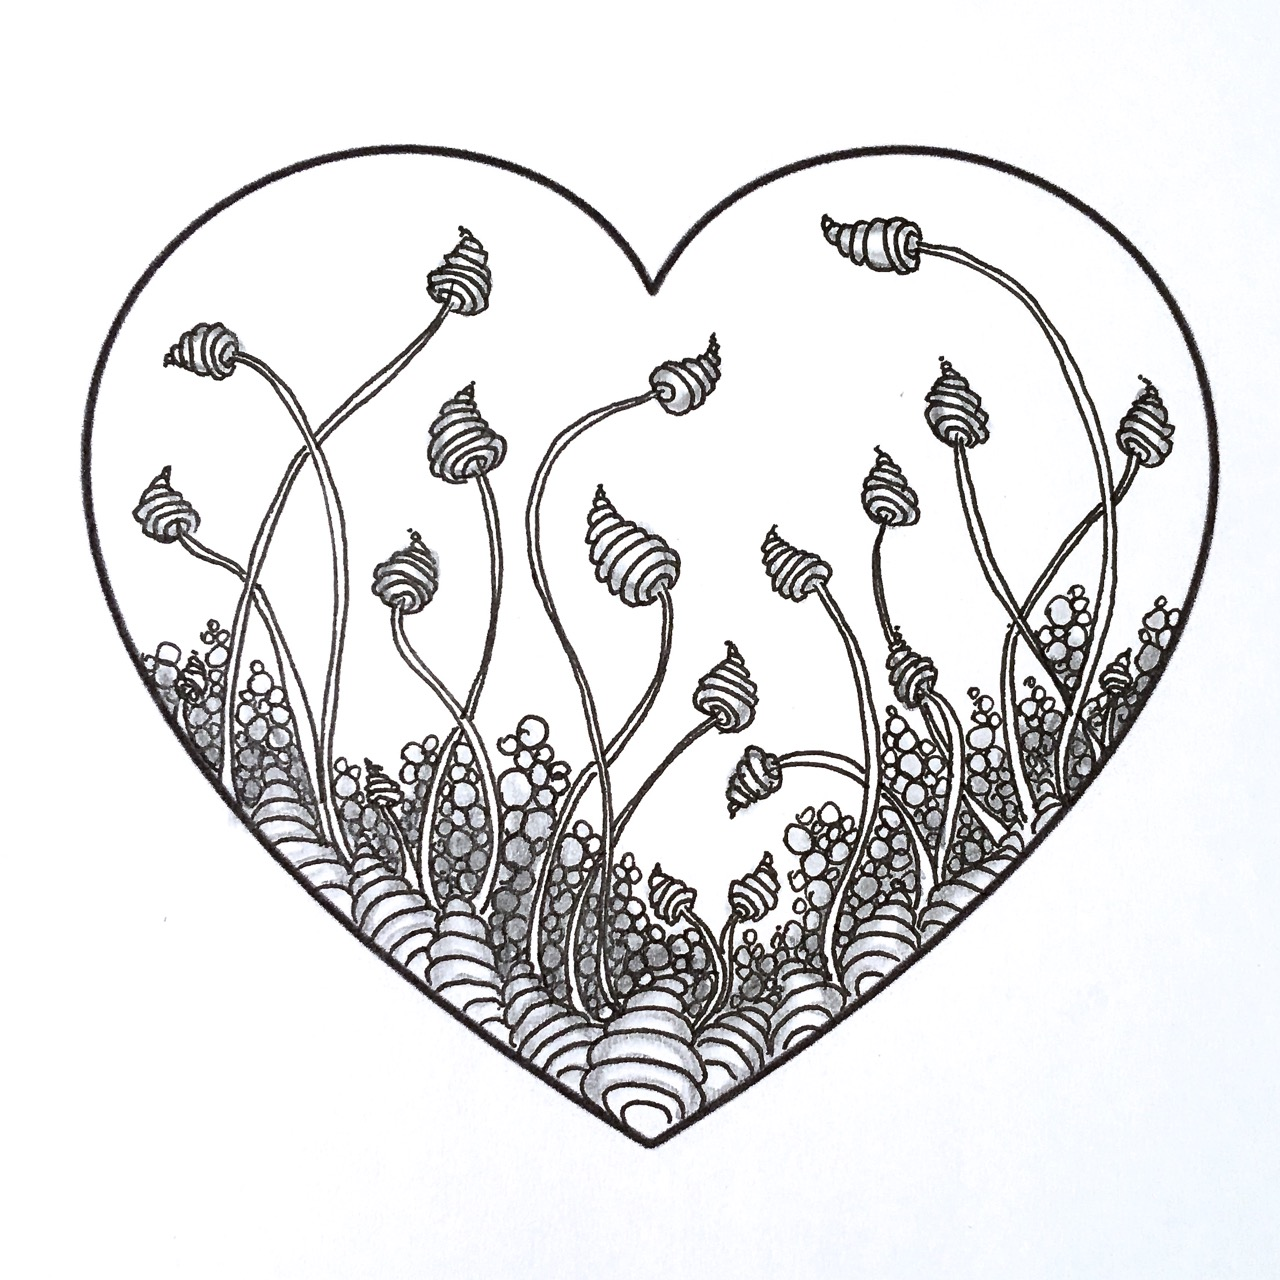 Zentangle Valentine's Heart Series Designs 2016 | Always Choose ...